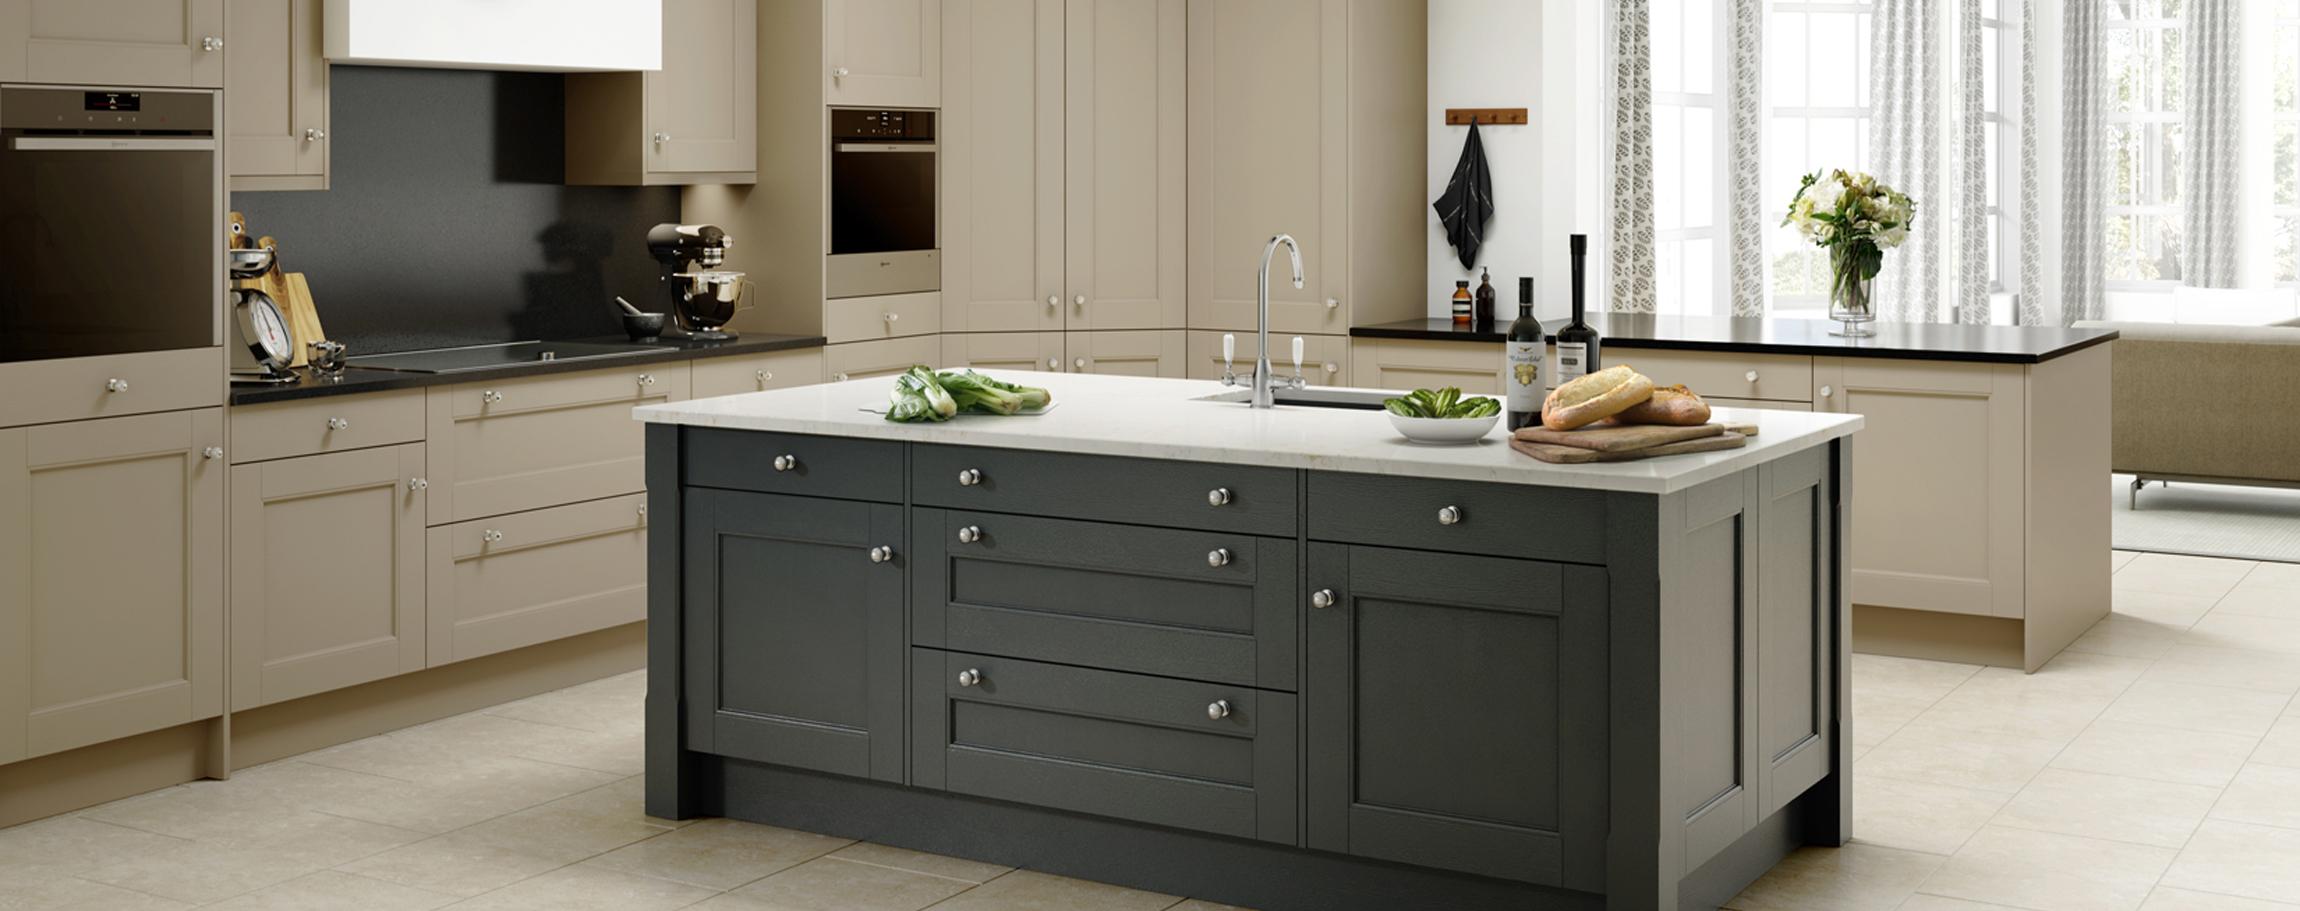 Home pocklington kitchen and bathrooms